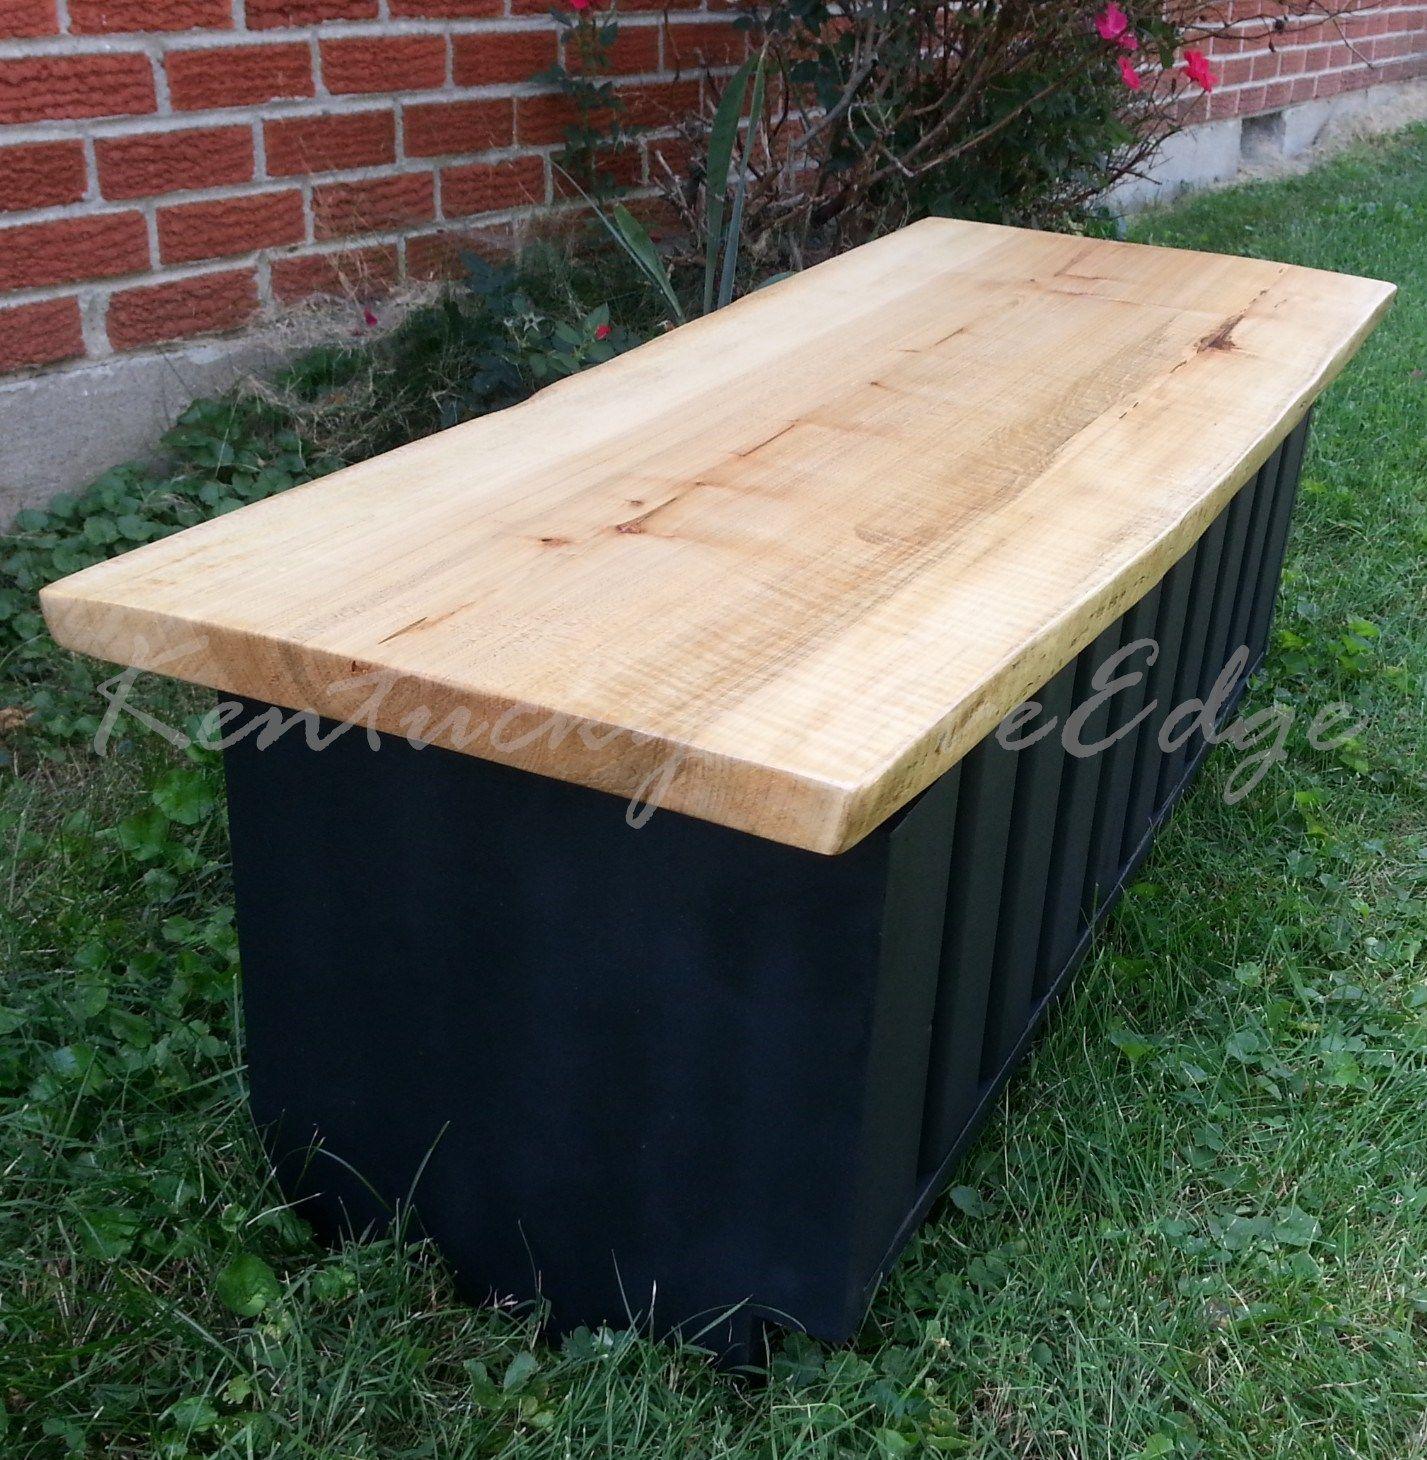 Buy A Custom Live Edge Coffee Table With Storage- Storage